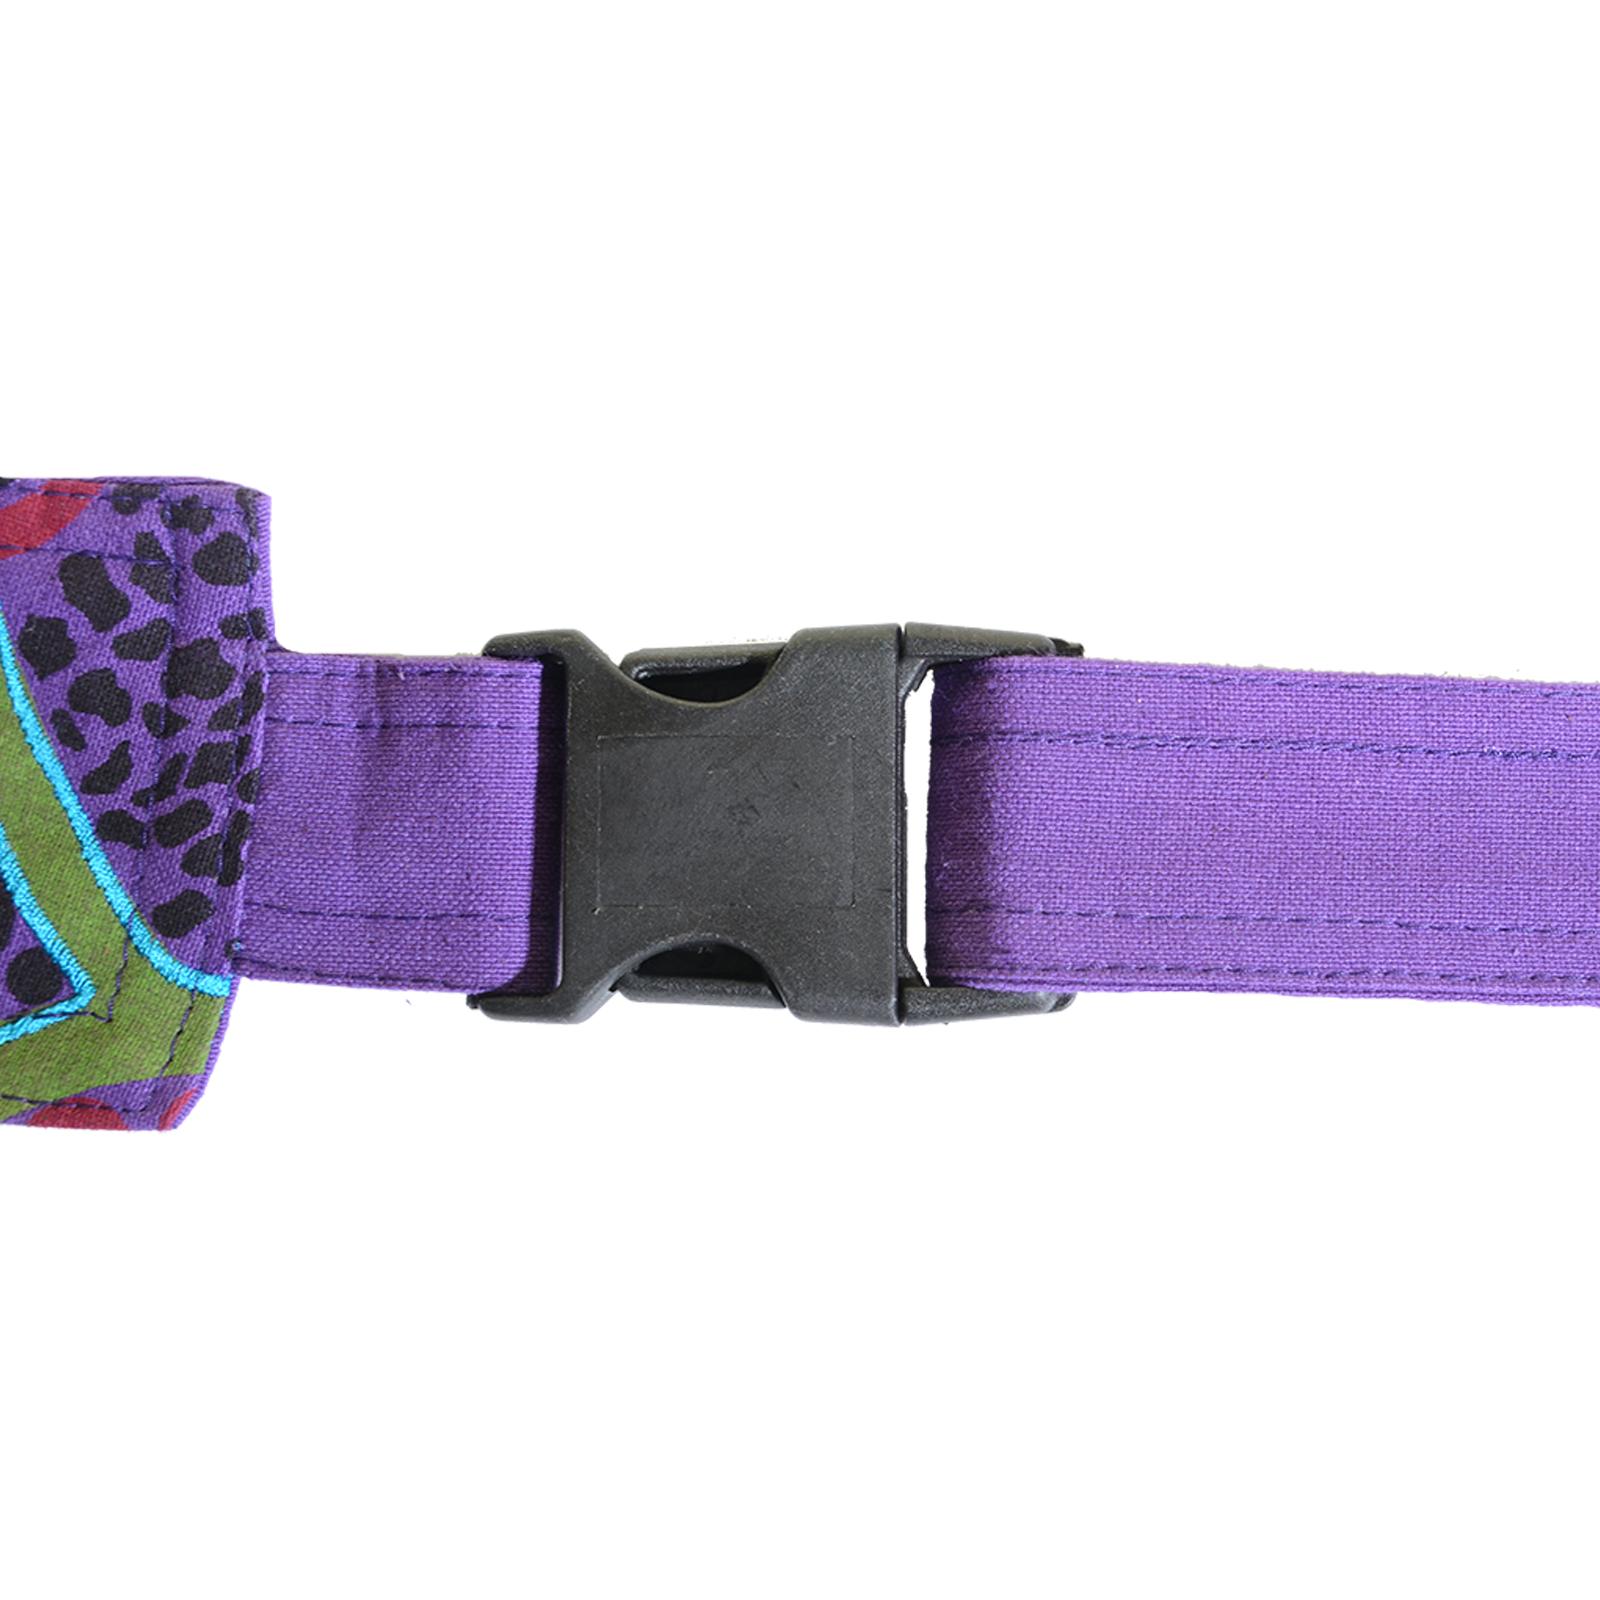 Angemessener Preis Nike Free 4.0 V2 Laverder Lila Grün